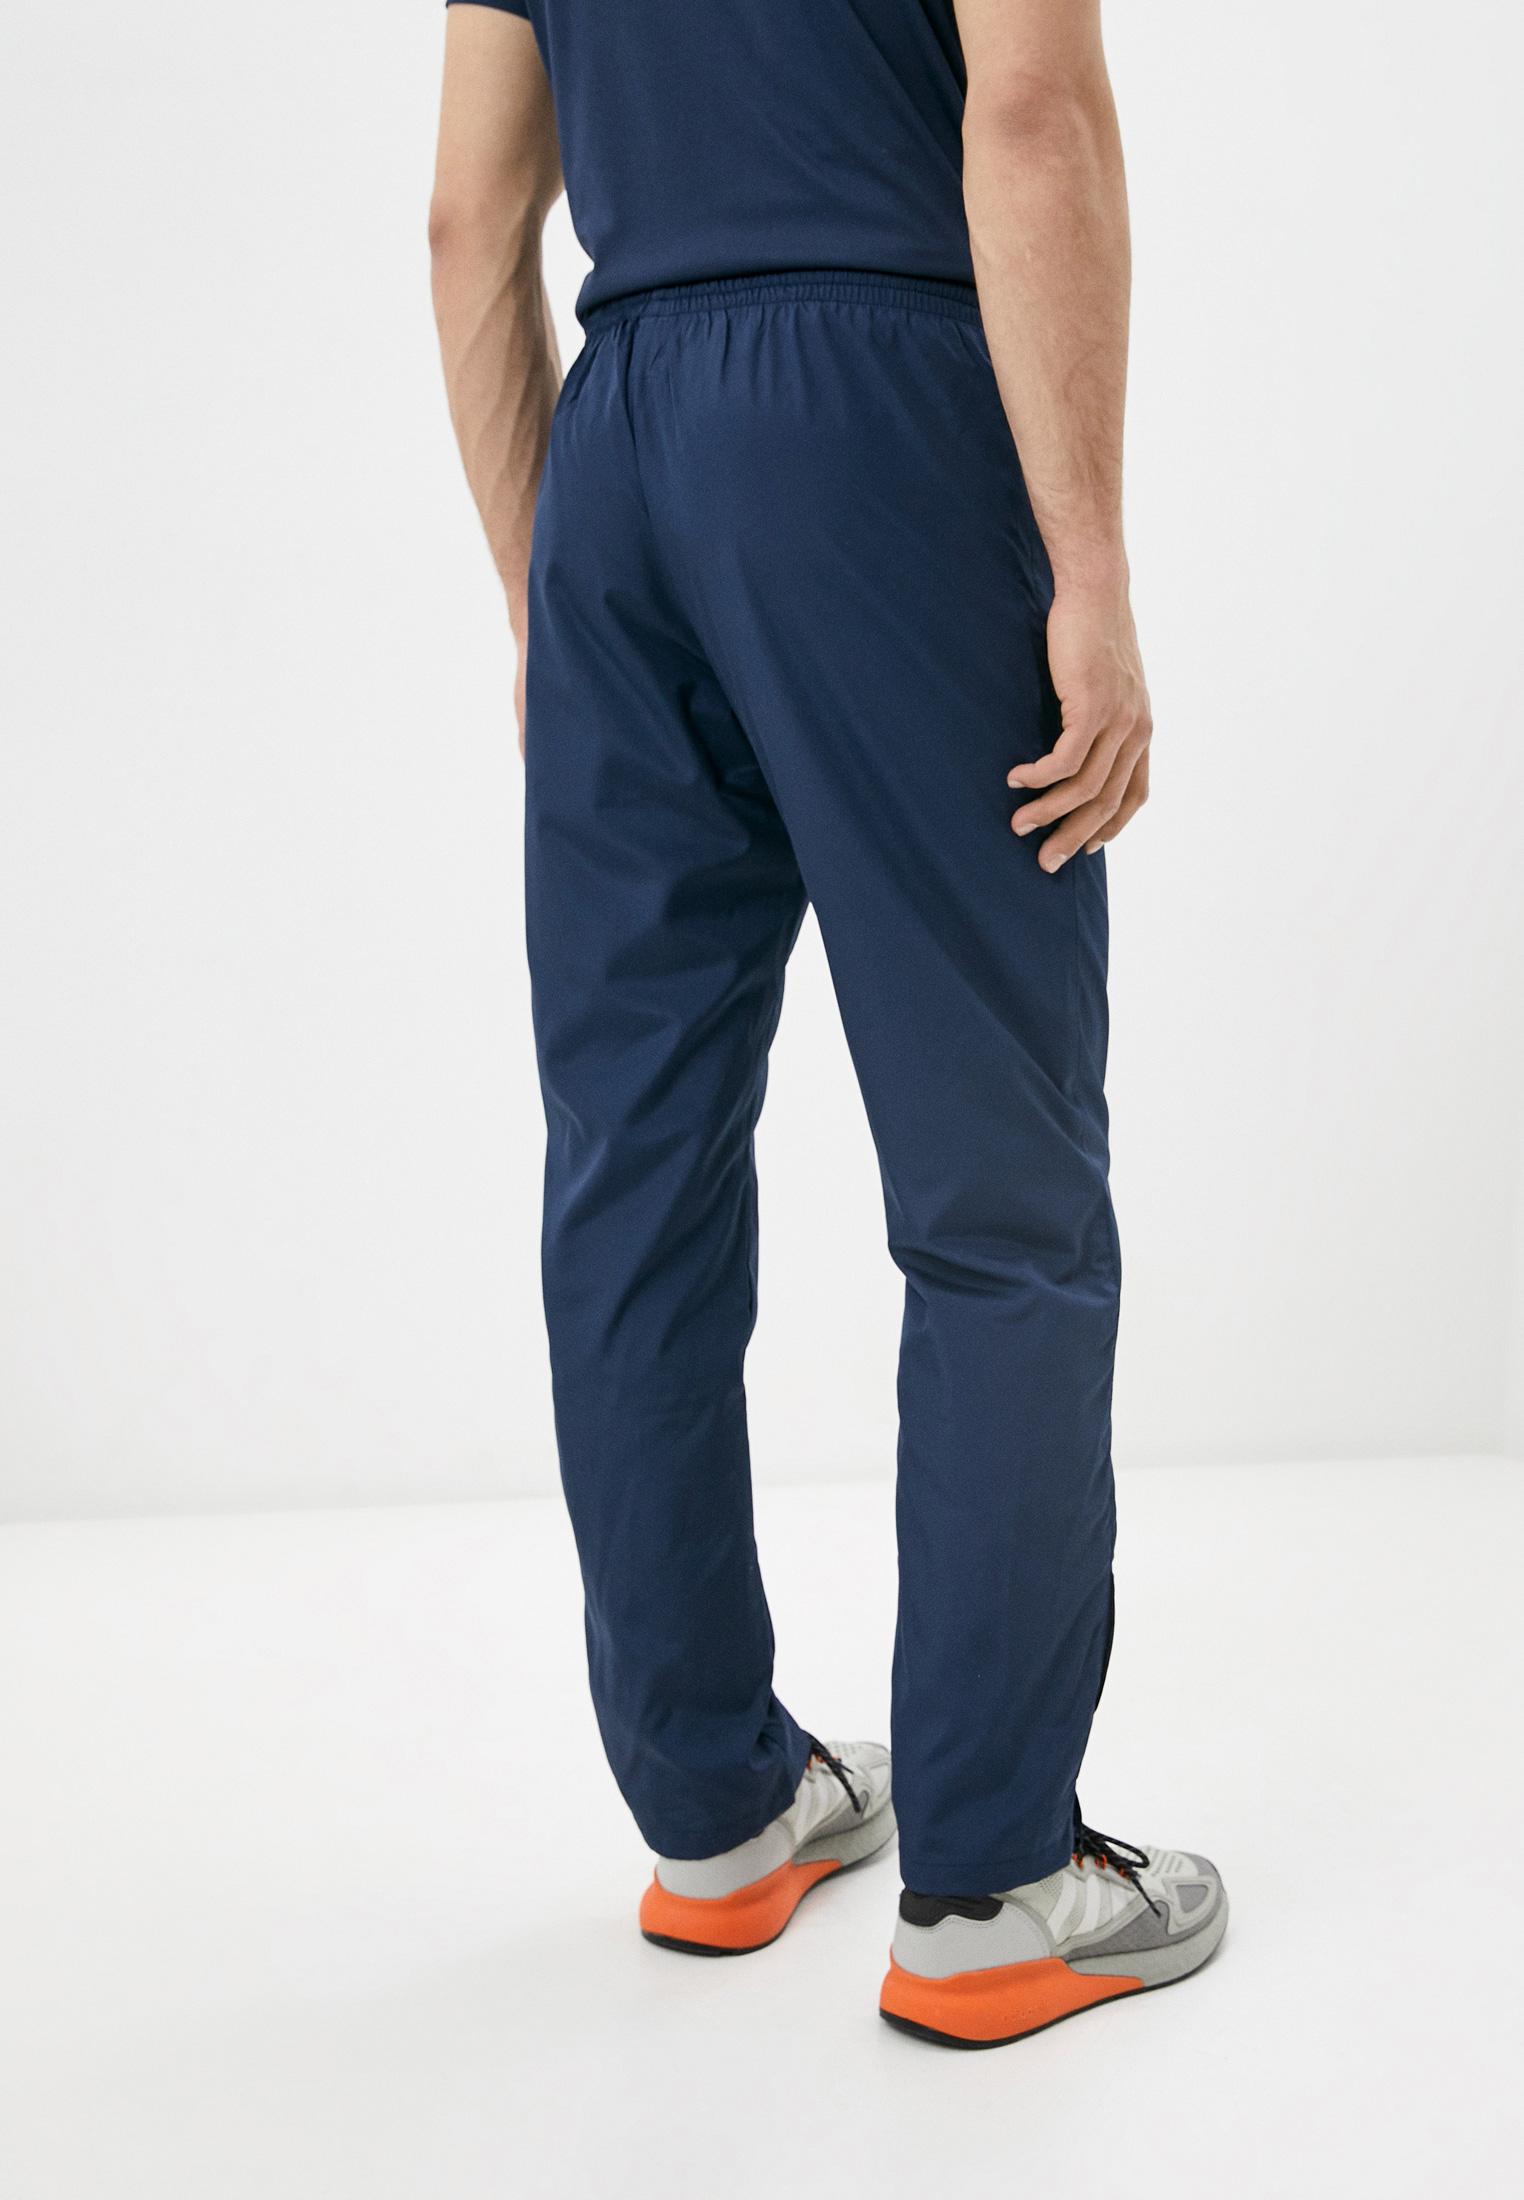 Мужские брюки Lotto 551220